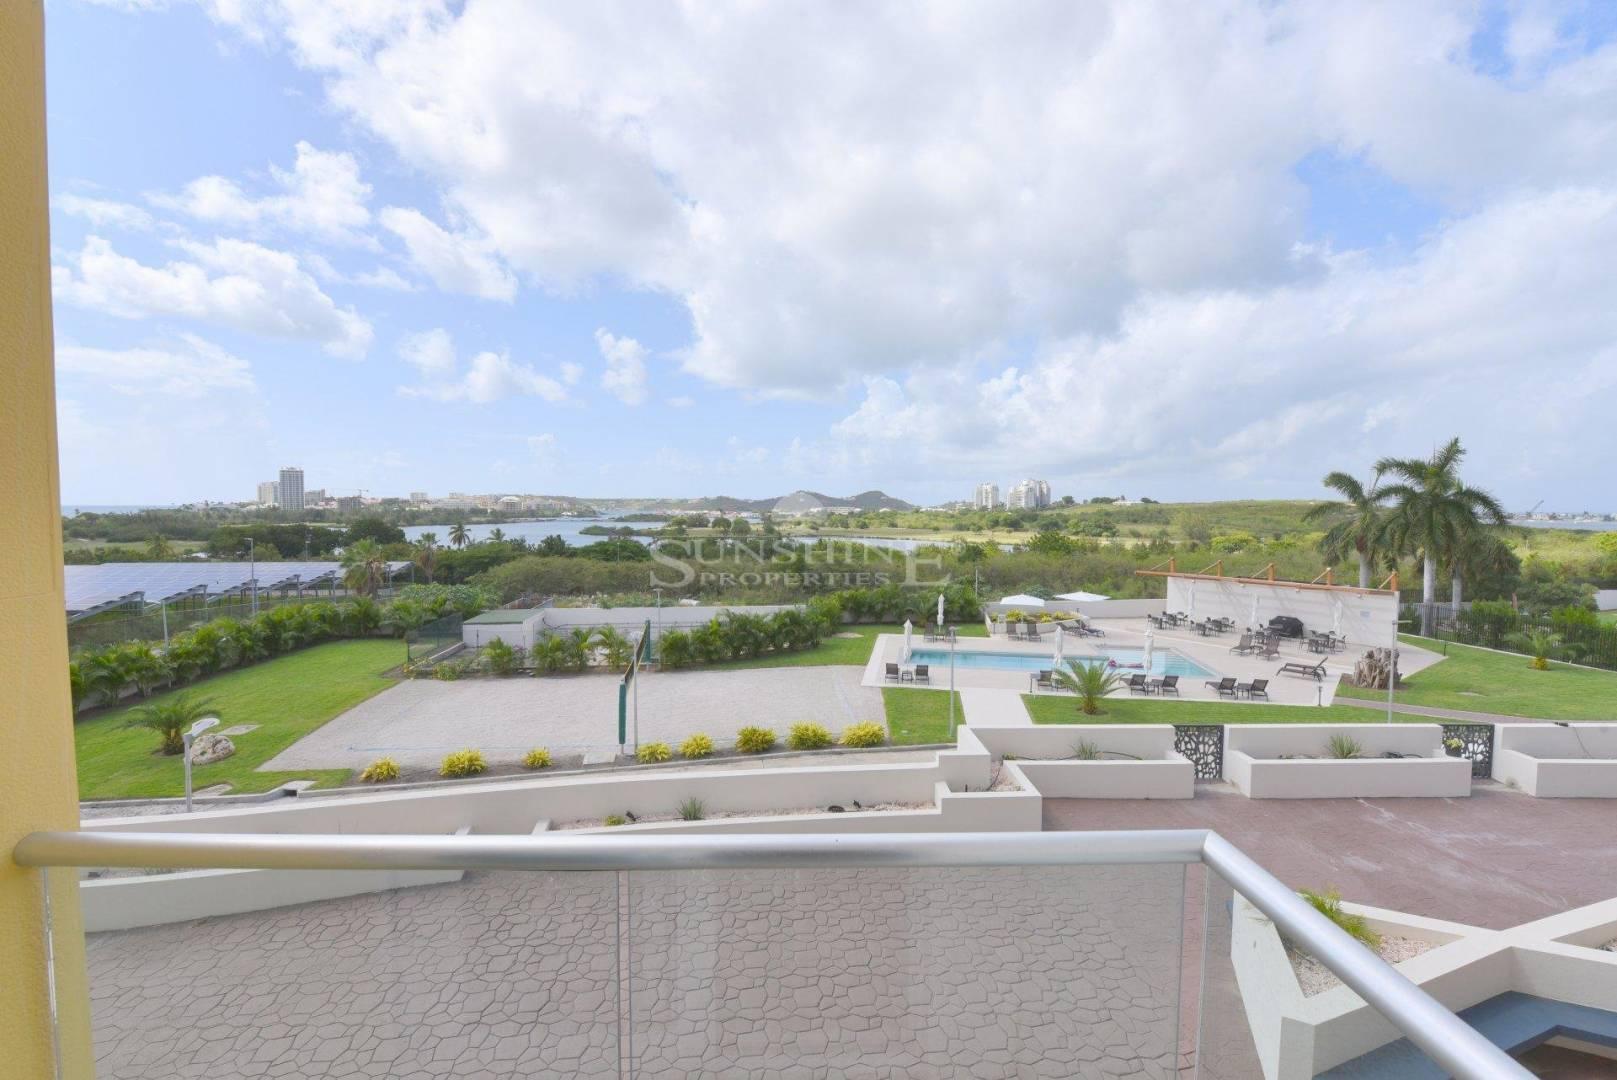 1 6 Sint Maarten